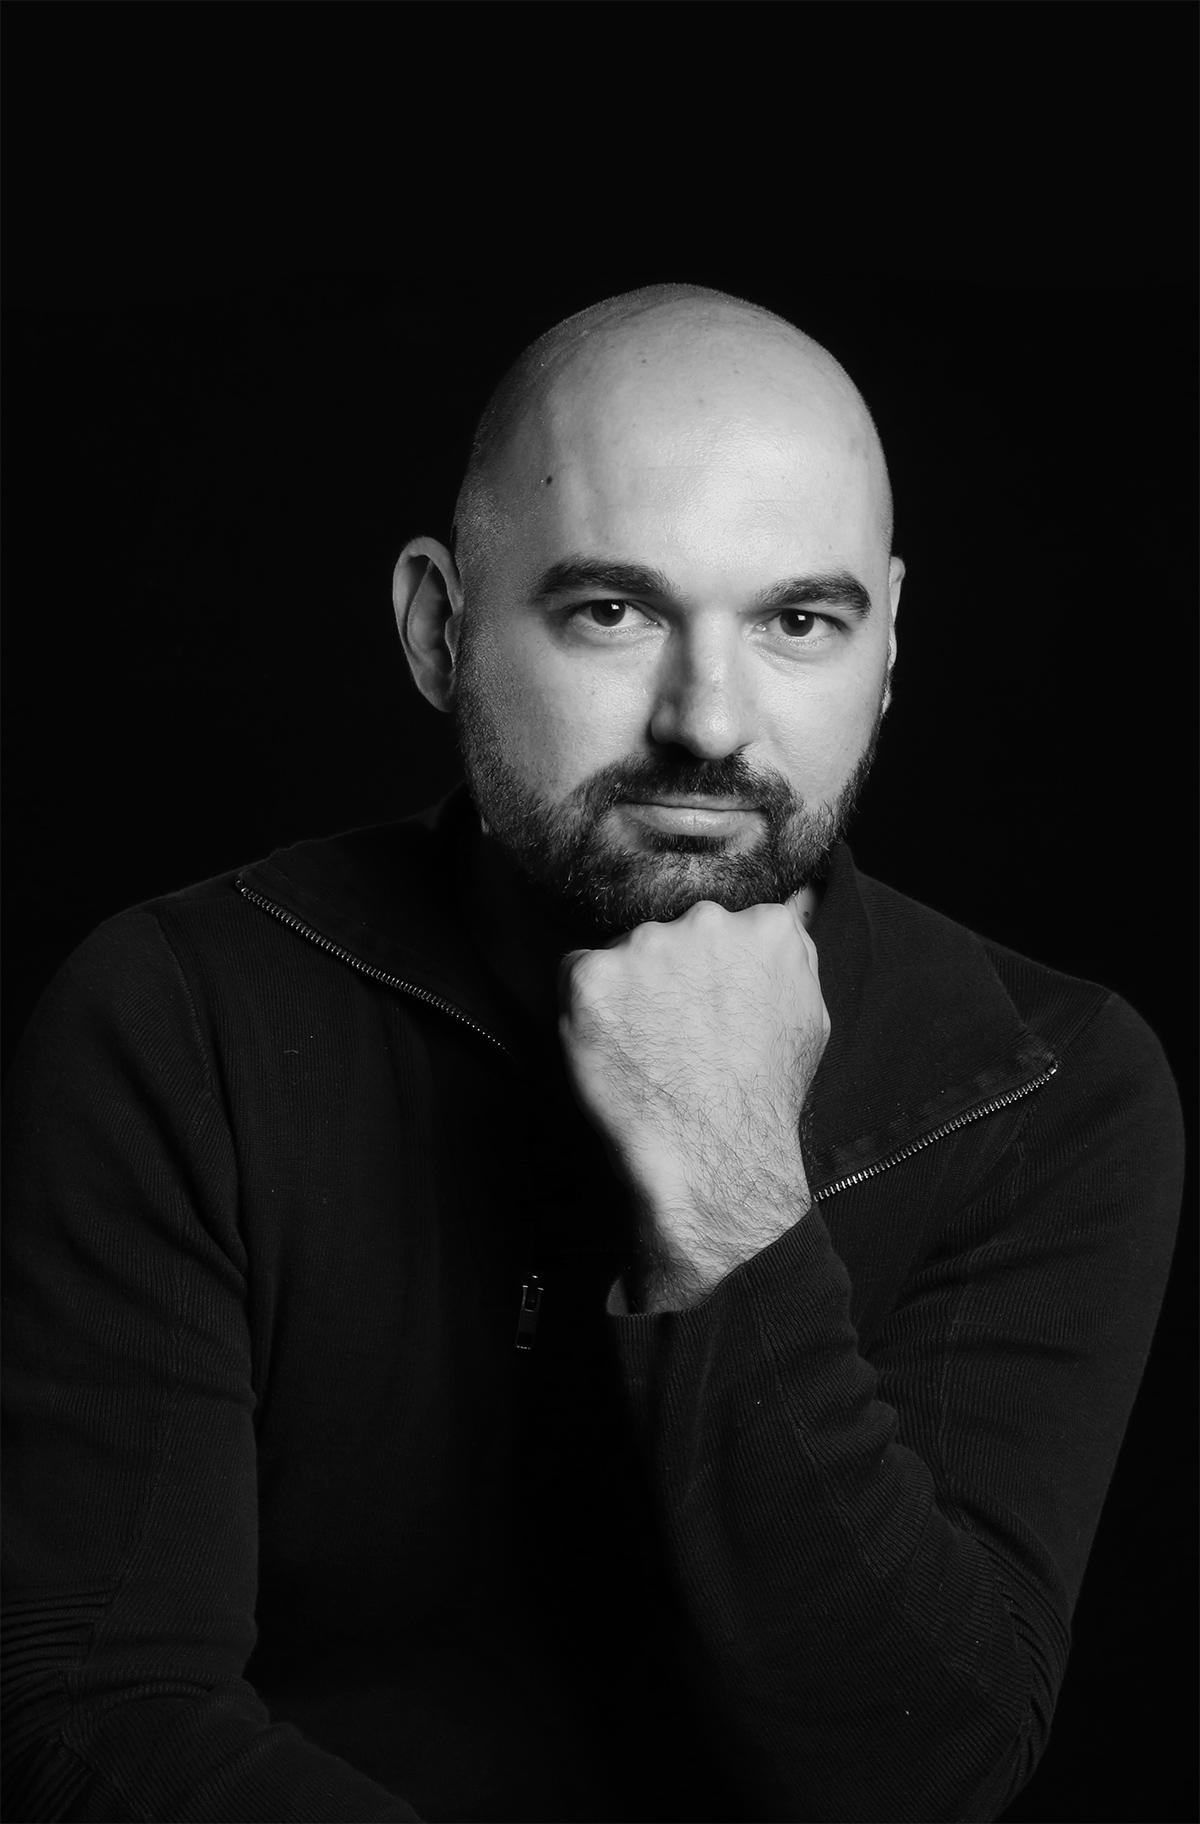 Formidable-Architectes-Portrait-Damien-Mikolajczyk